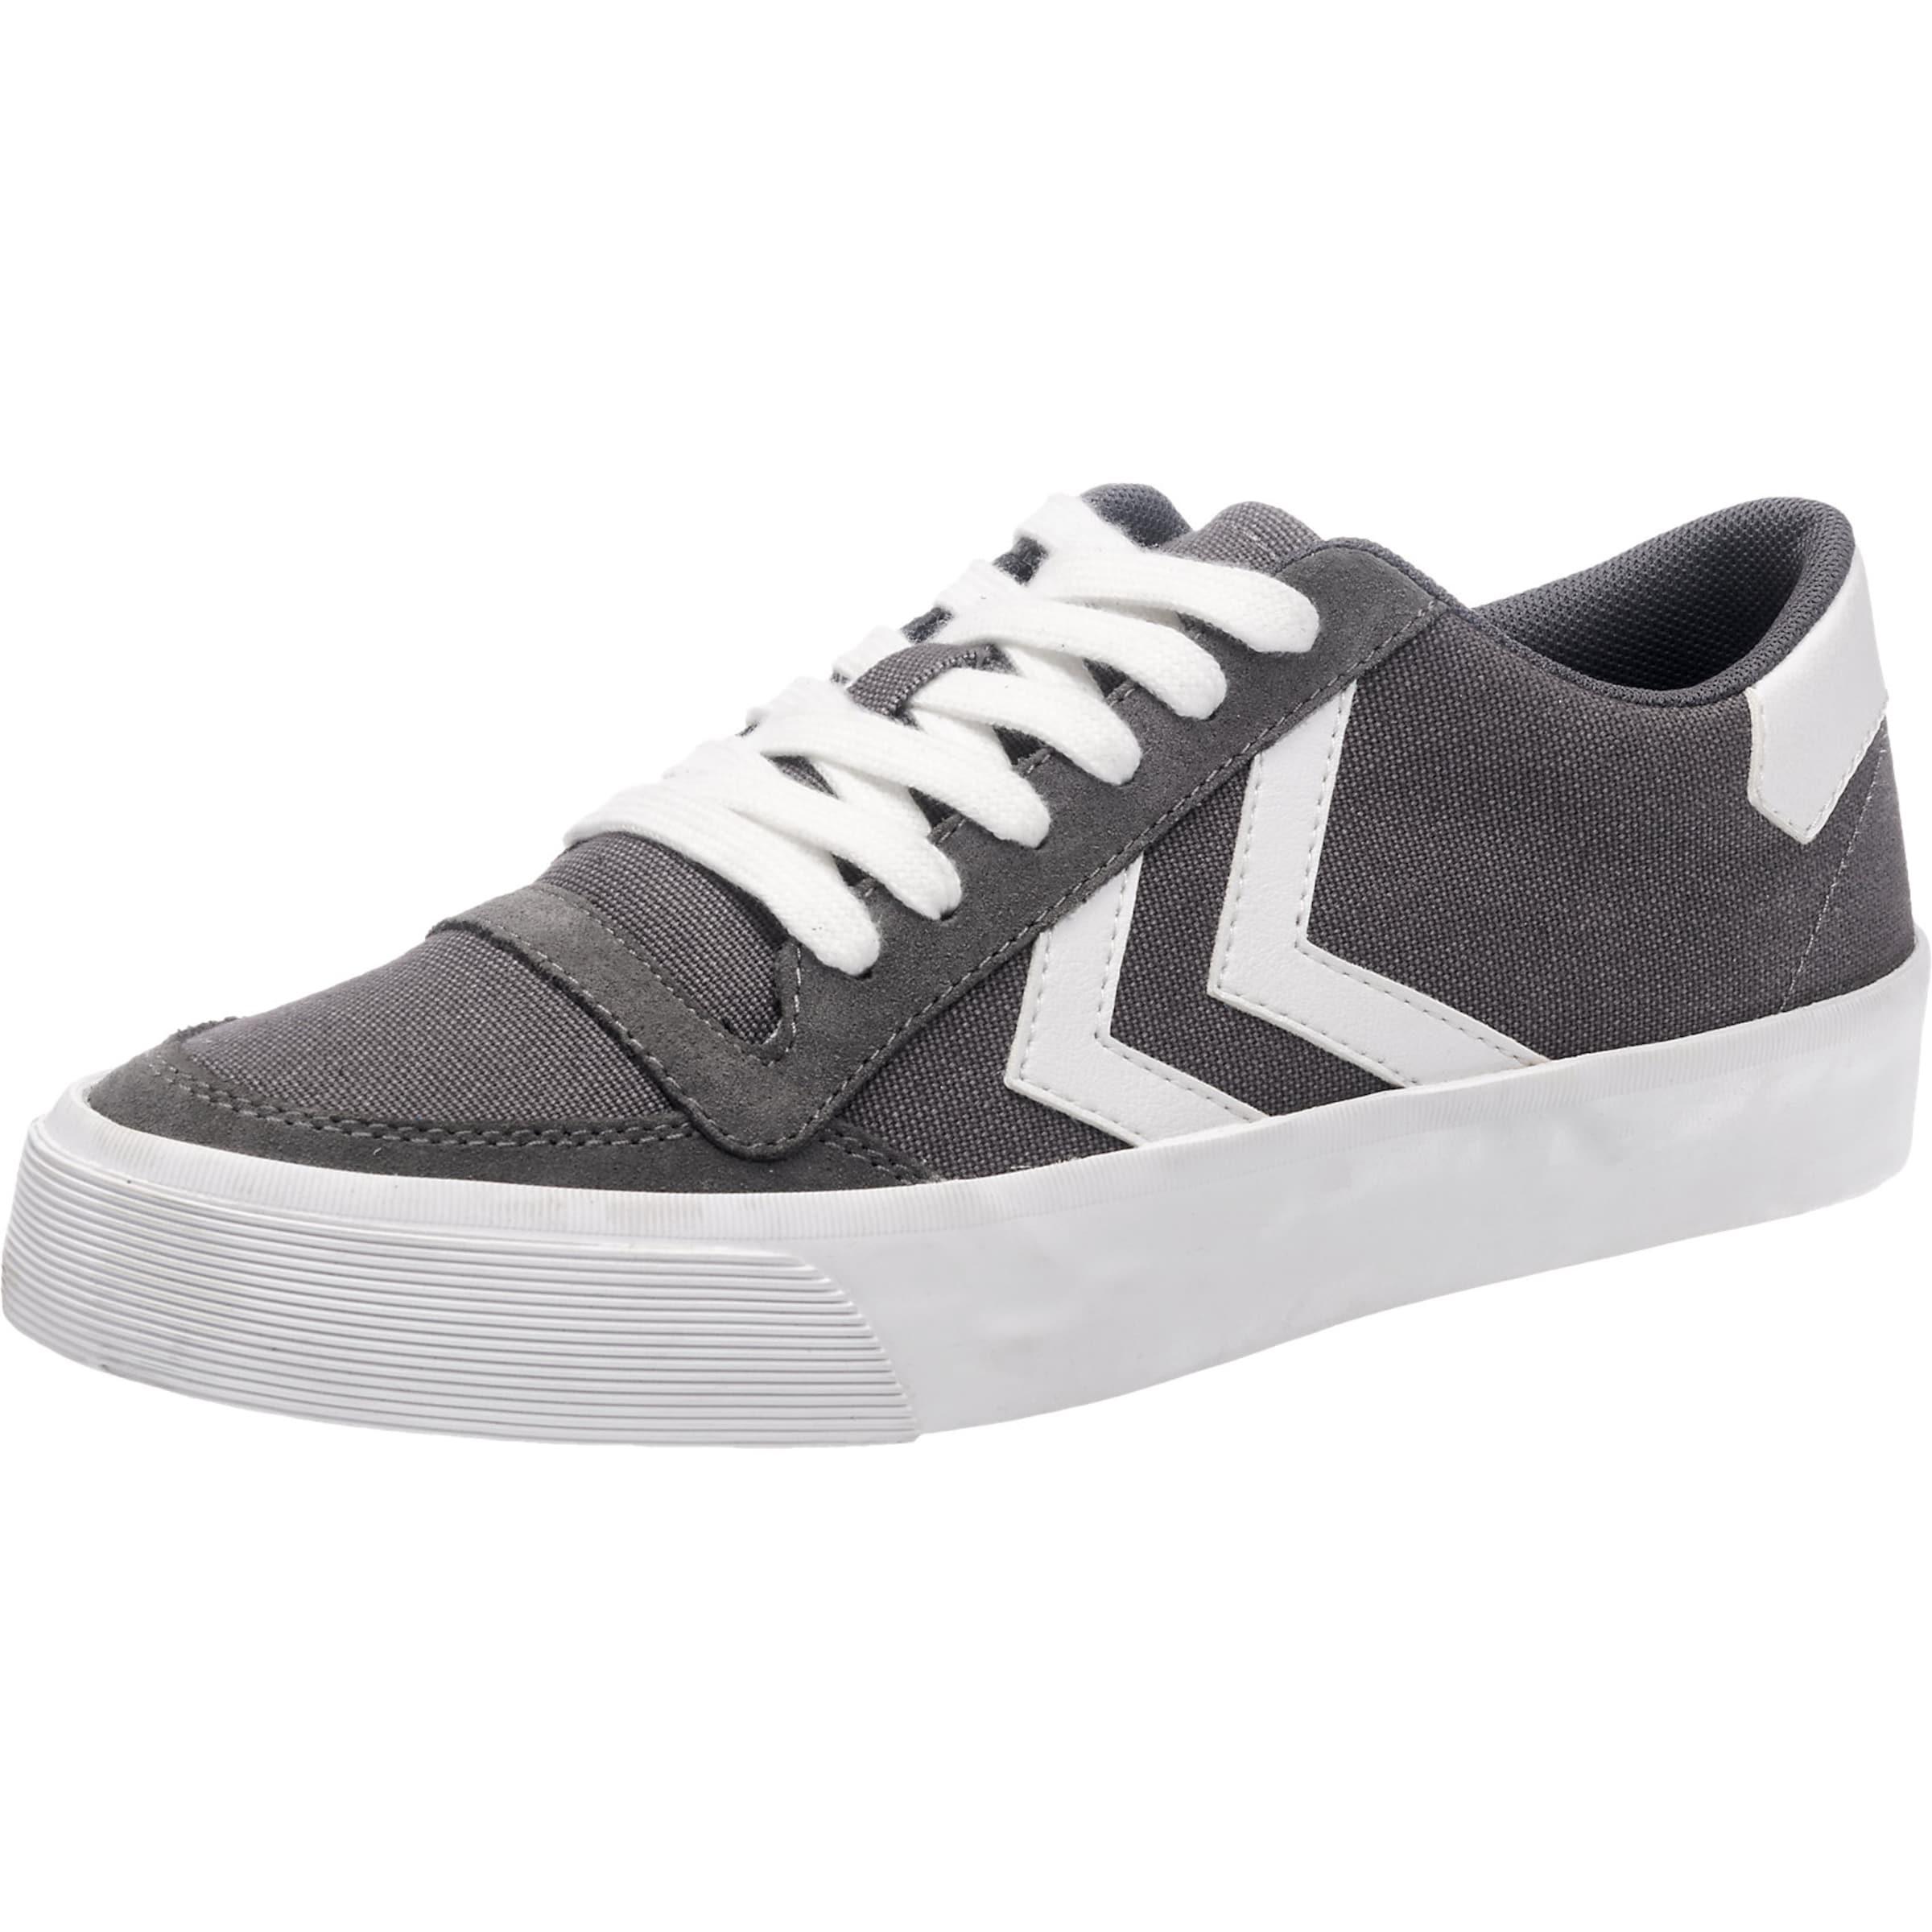 Hummel Sneakers Stadil Rmx Low Hohe Qualität